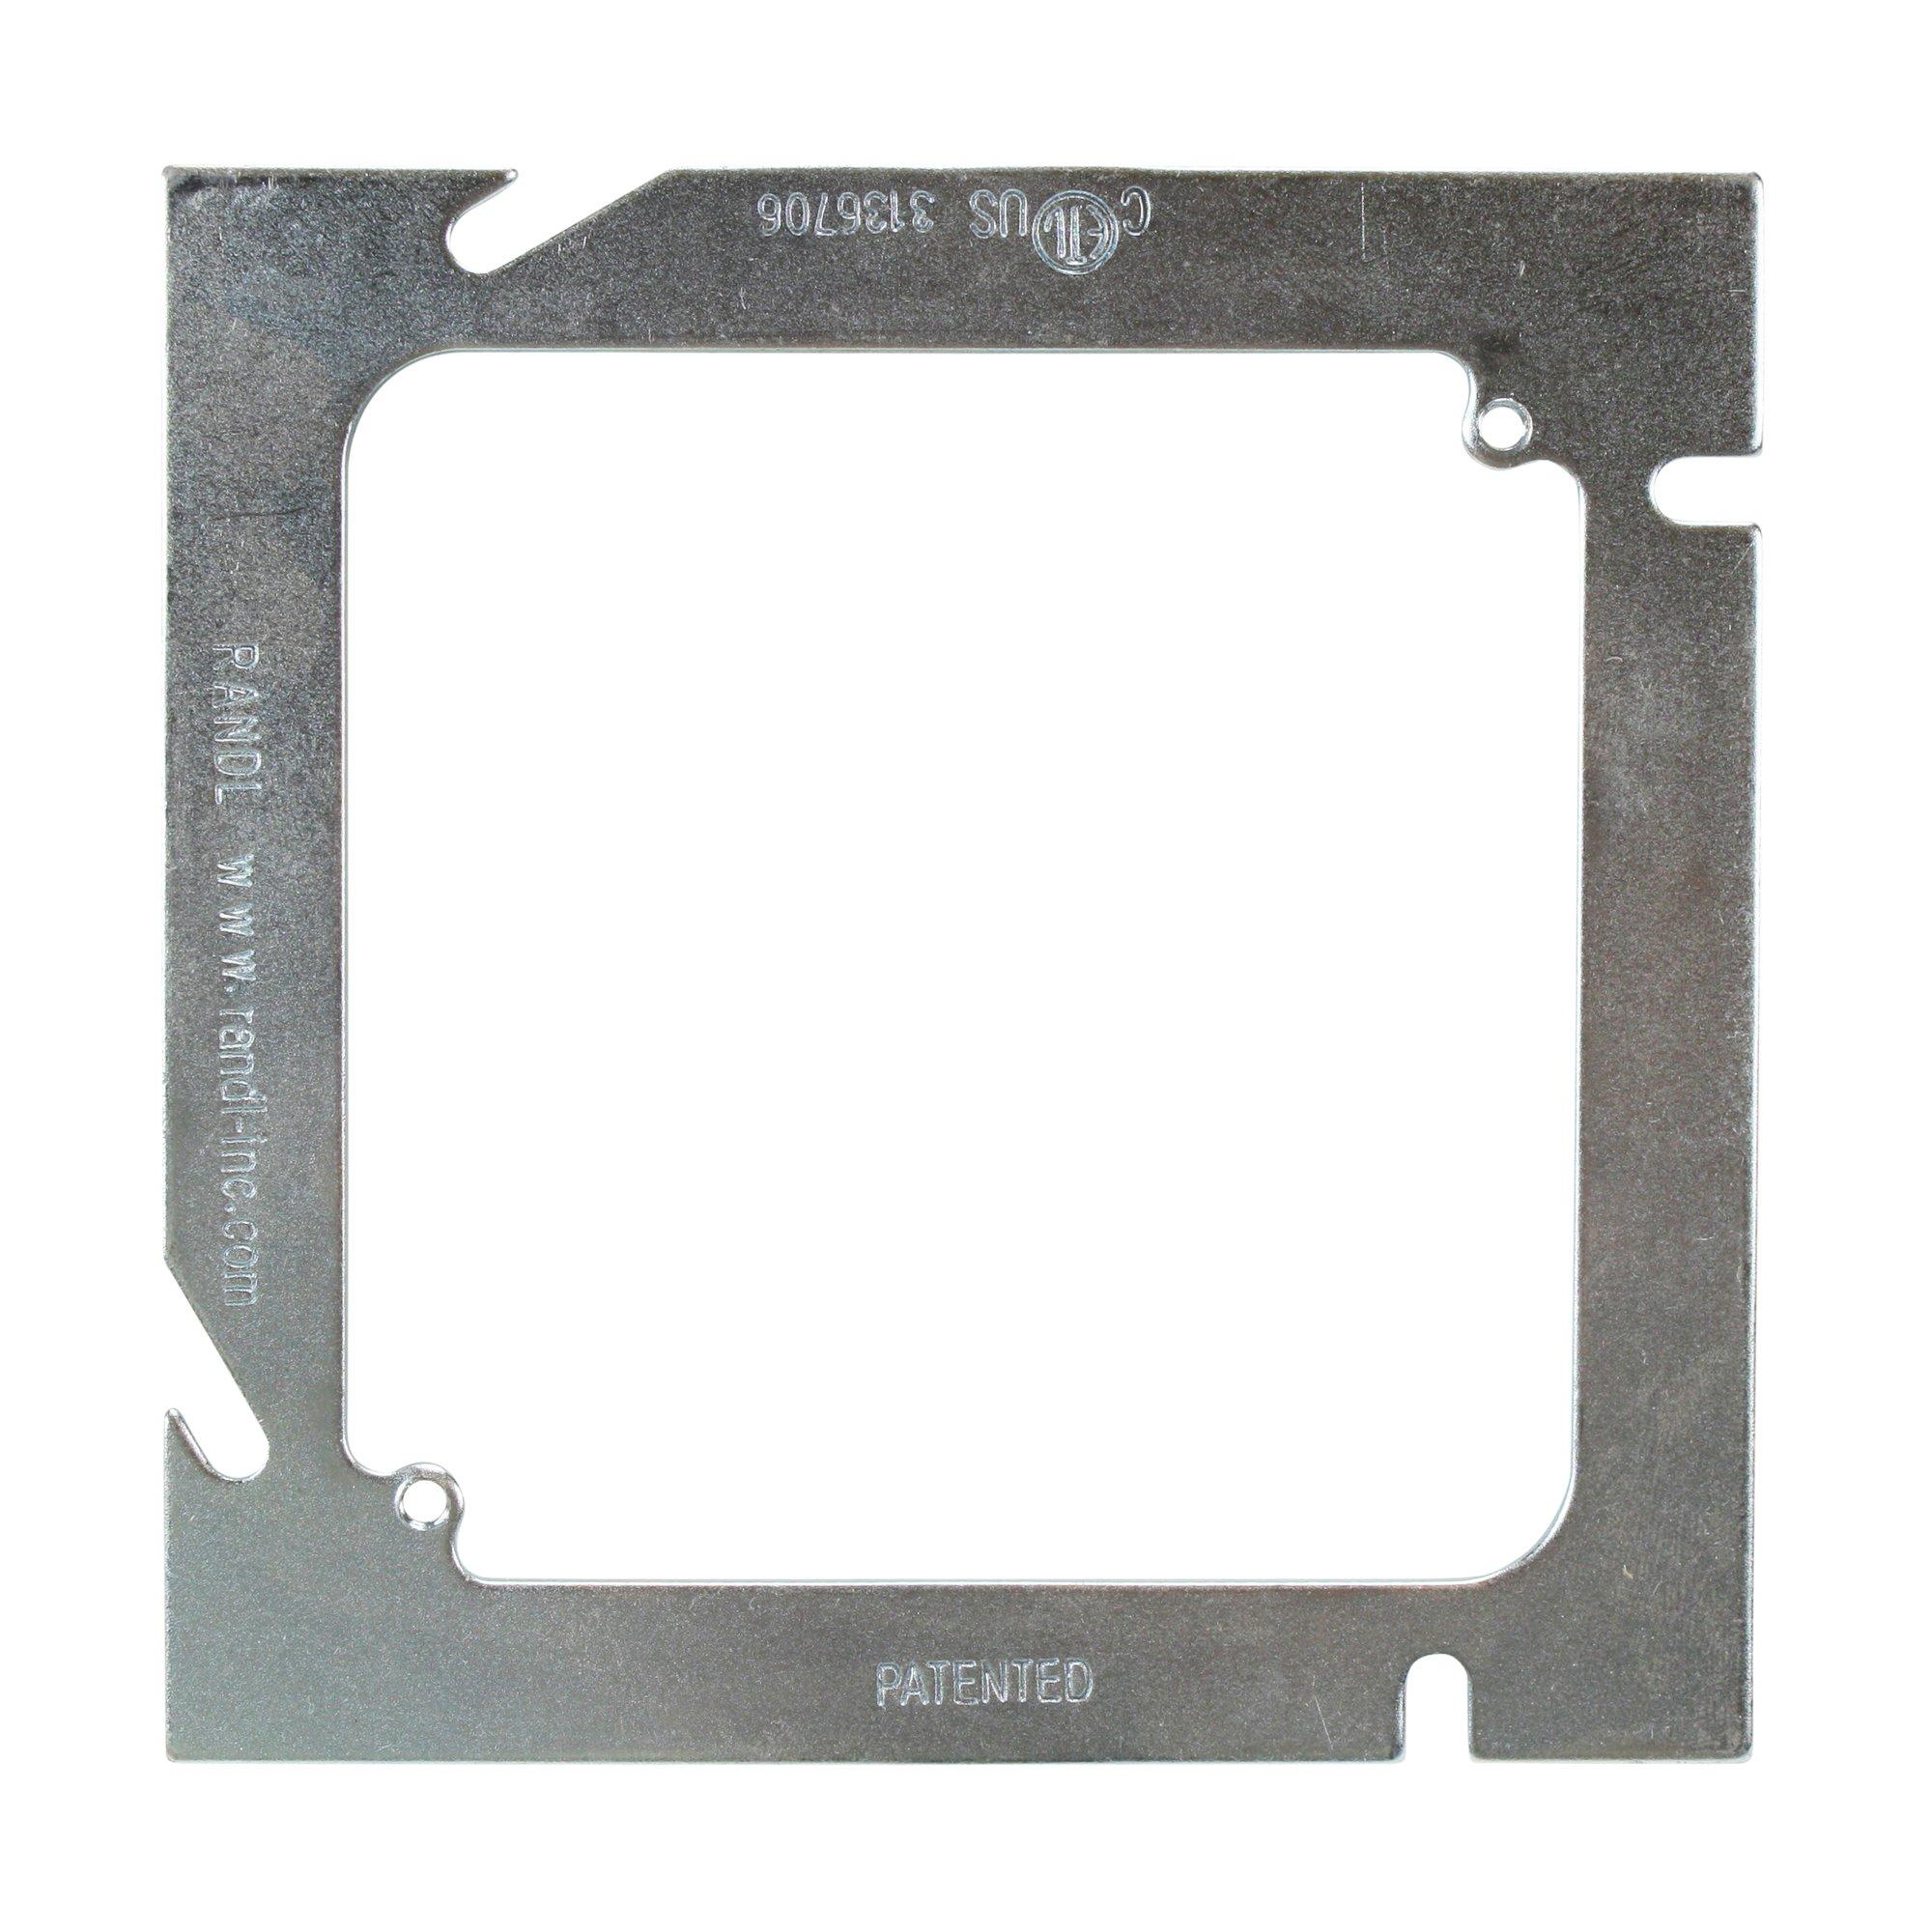 Randl N-54000 Flat 5'' X 4'' Square Outlet Box Ring 5 Swaure Box (20 Pack)